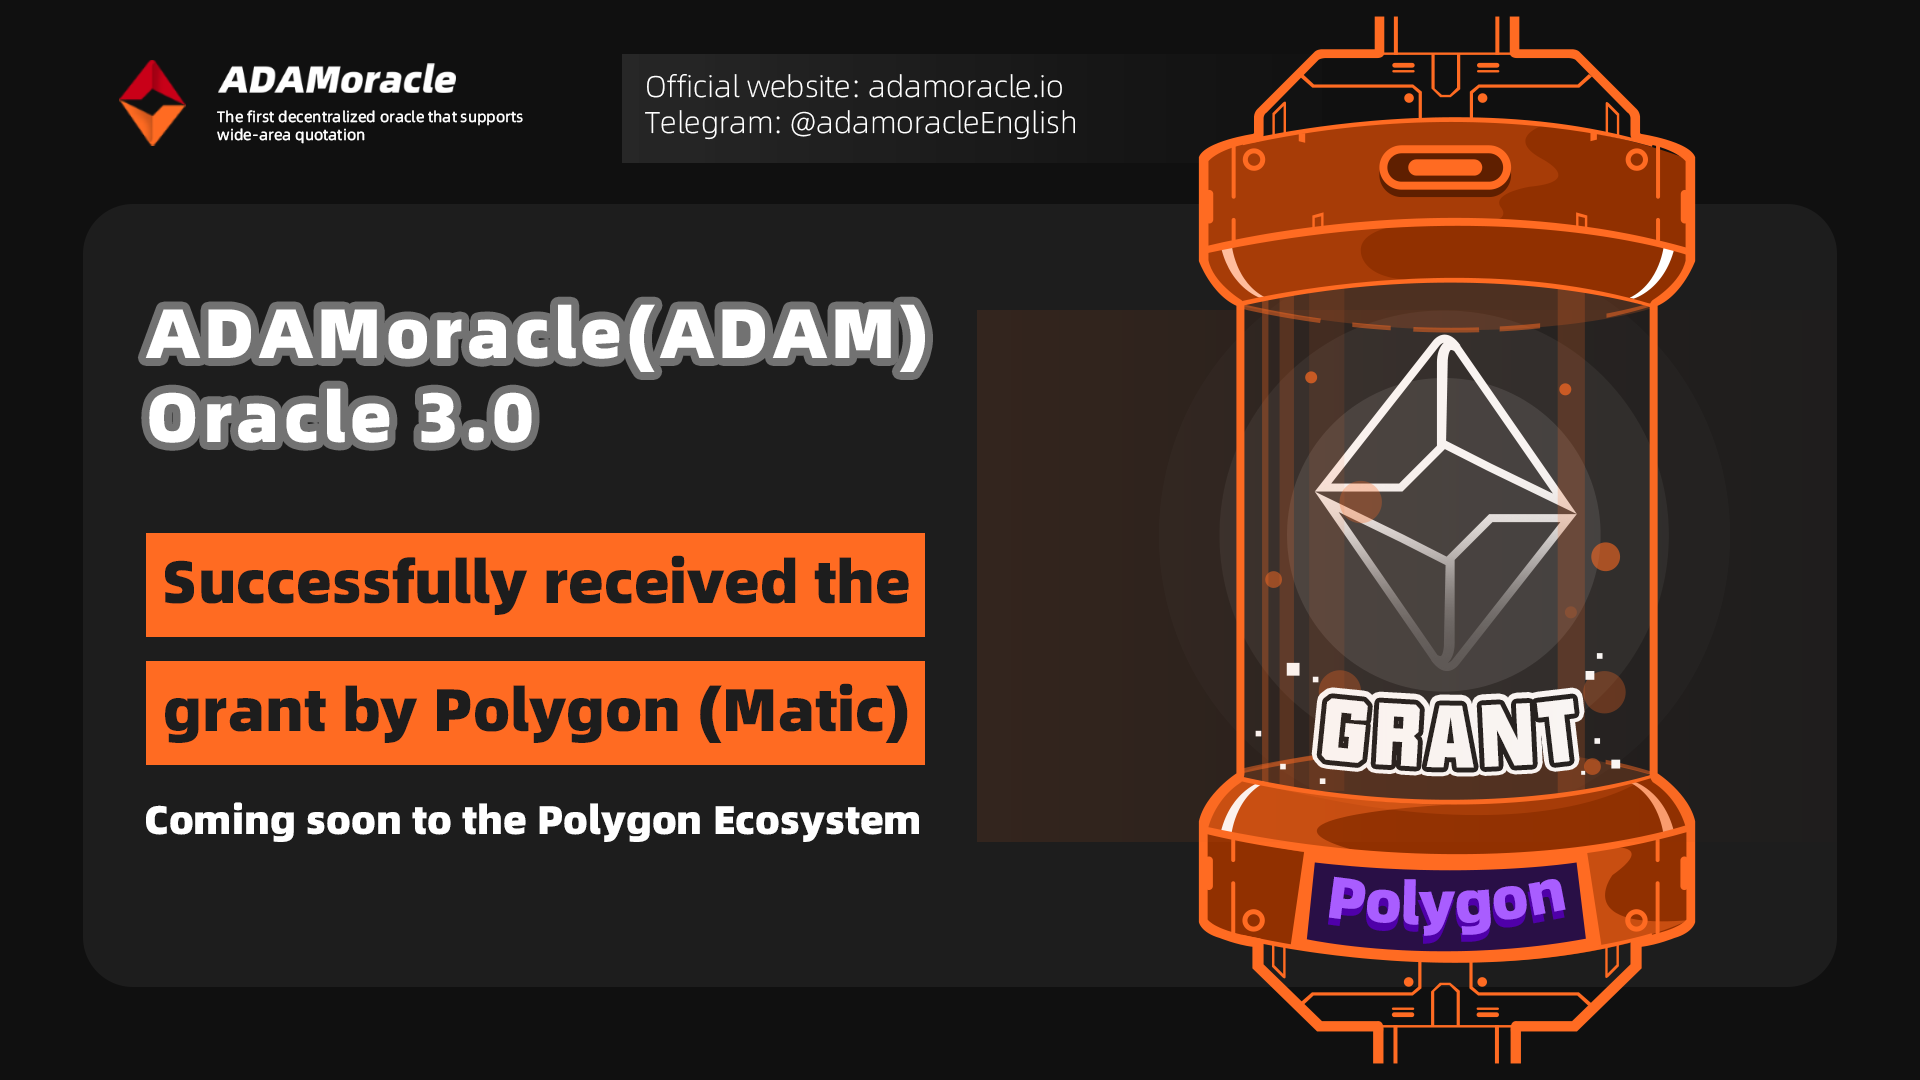 ADAMoracle成功获Polygon Grant支持共建ADAM挖矿共识